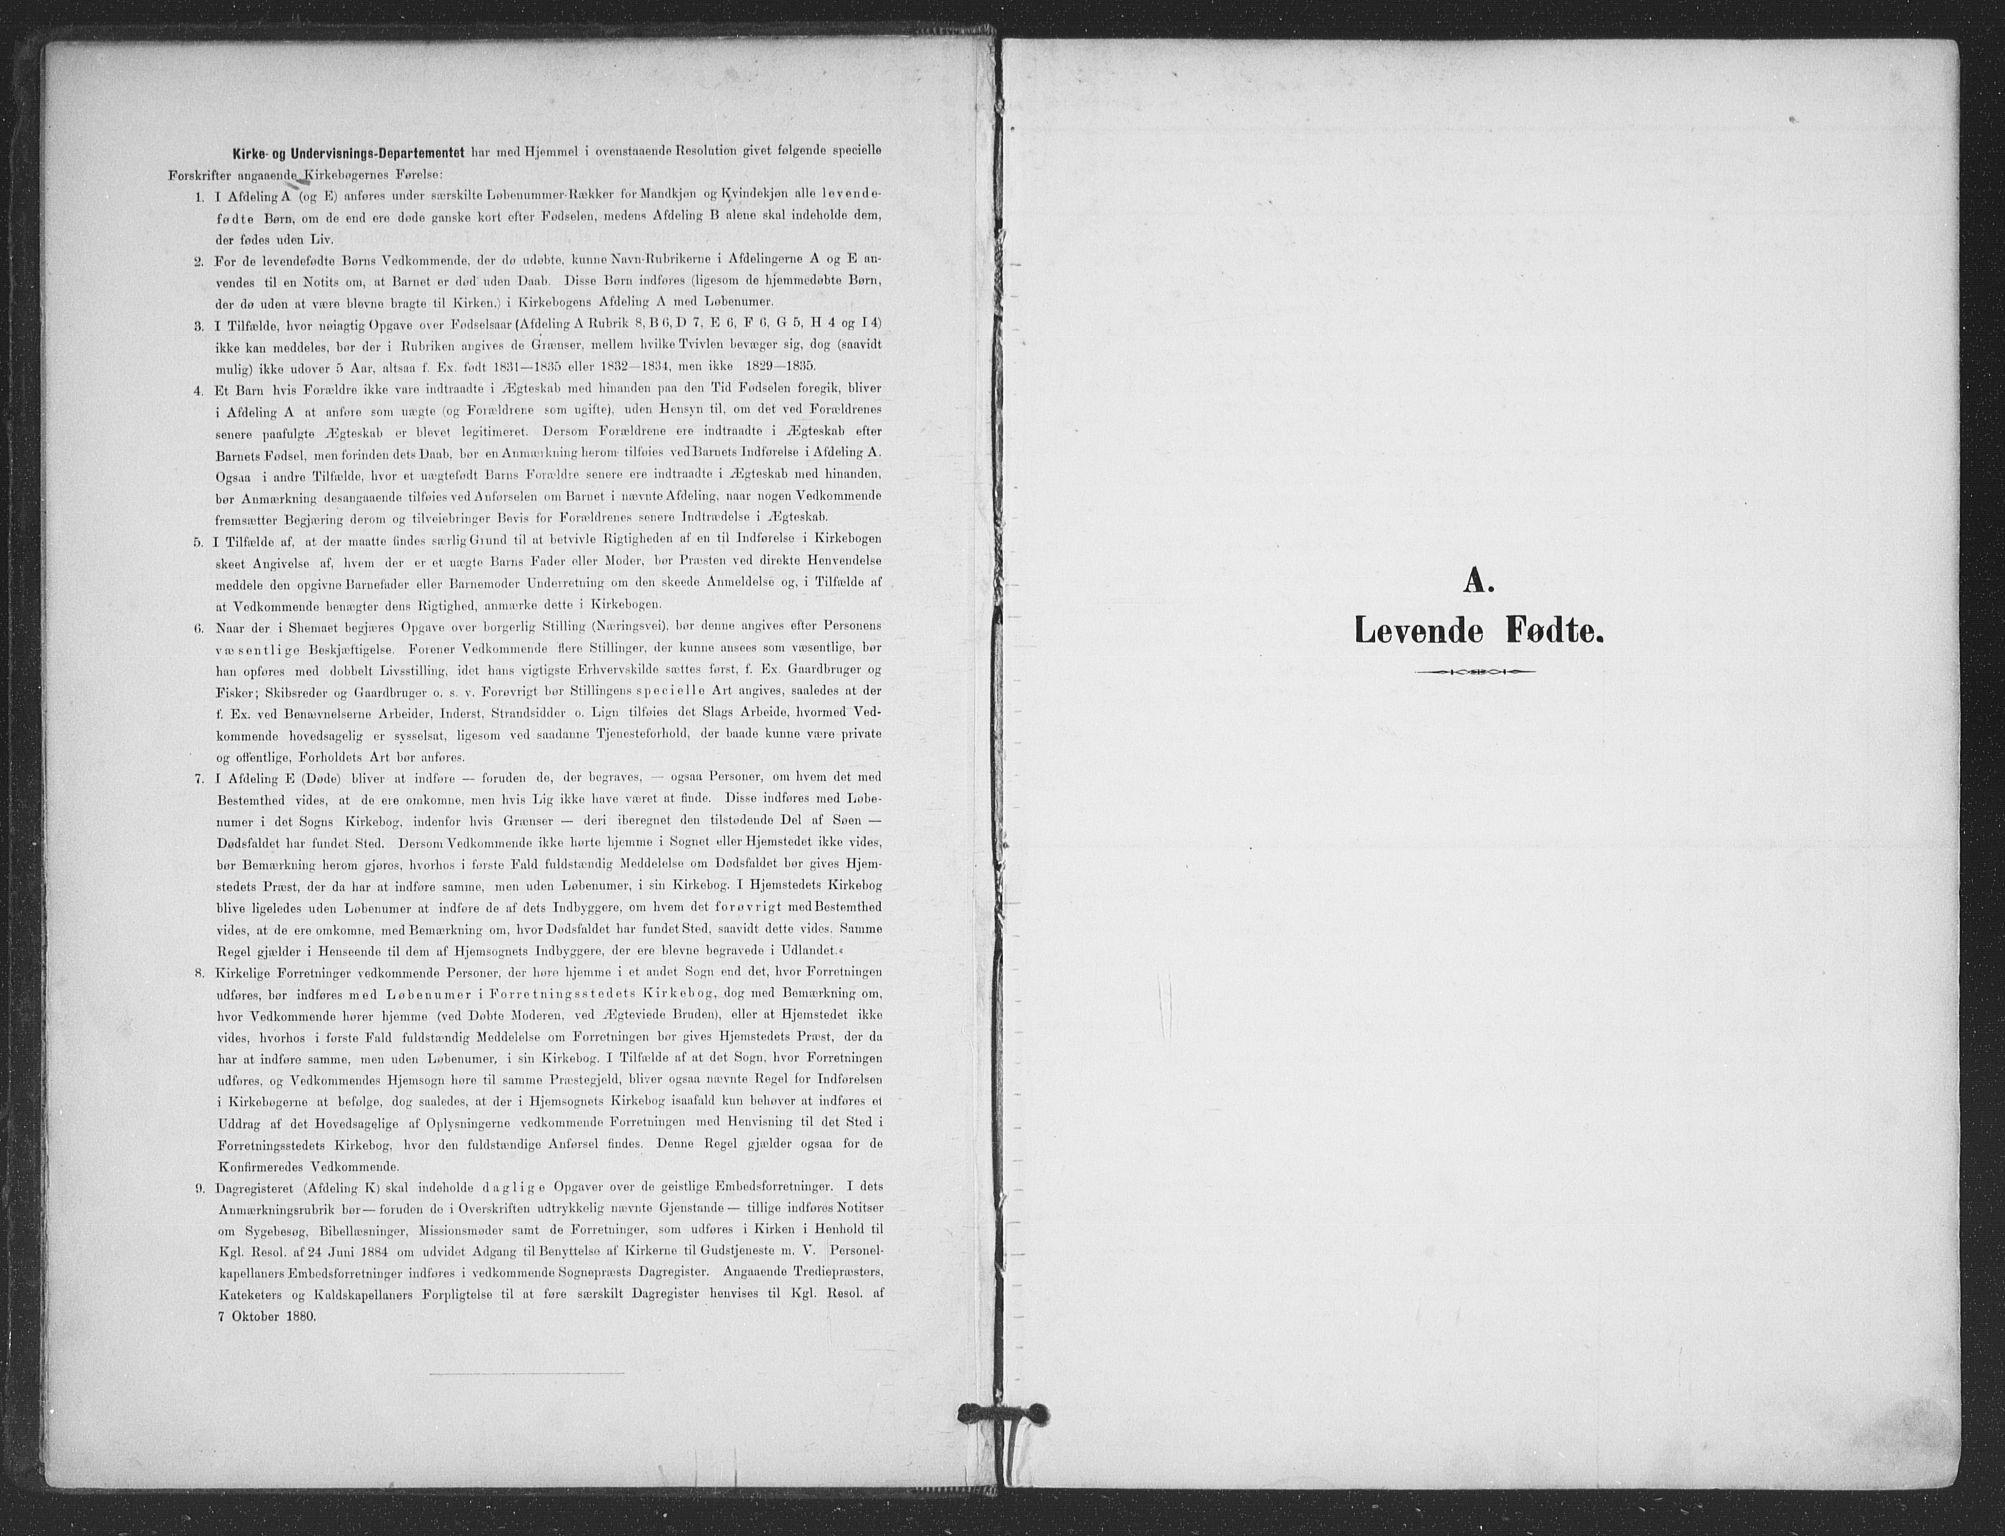 SAT, Ministerialprotokoller, klokkerbøker og fødselsregistre - Nordland, 866/L0939: Ministerialbok nr. 866A02, 1894-1906